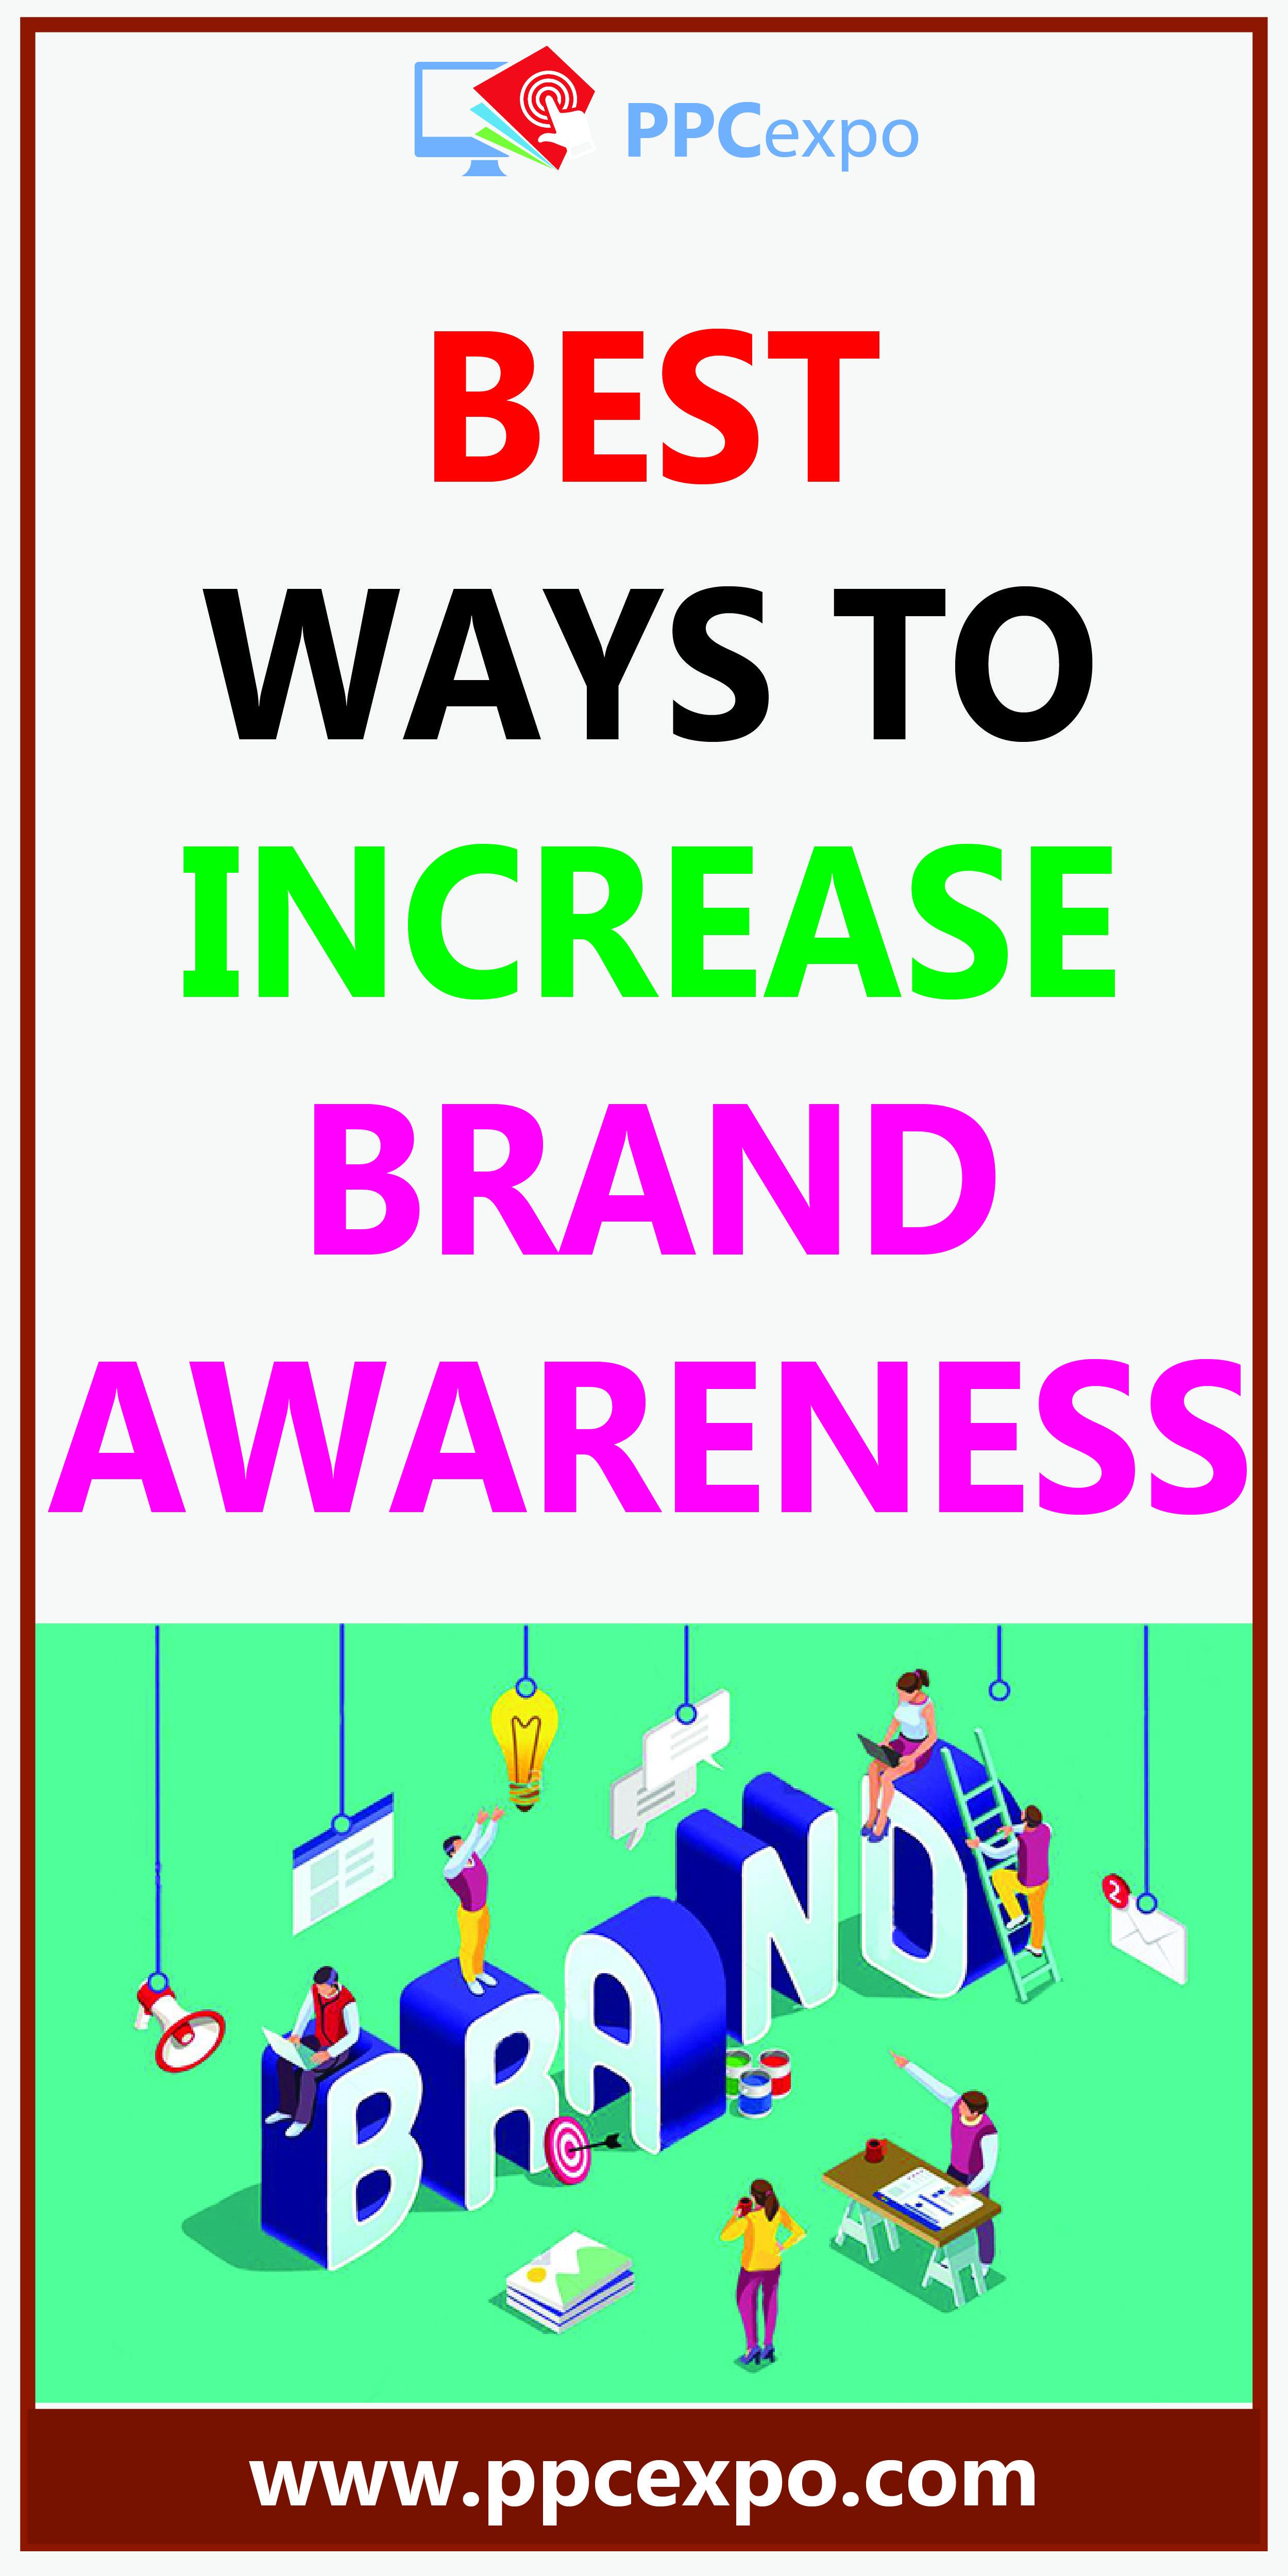 Best Ways To Increase Brand Awareness In 2020 Brand Awareness Marketing Strategy Social Media Digital Marketing